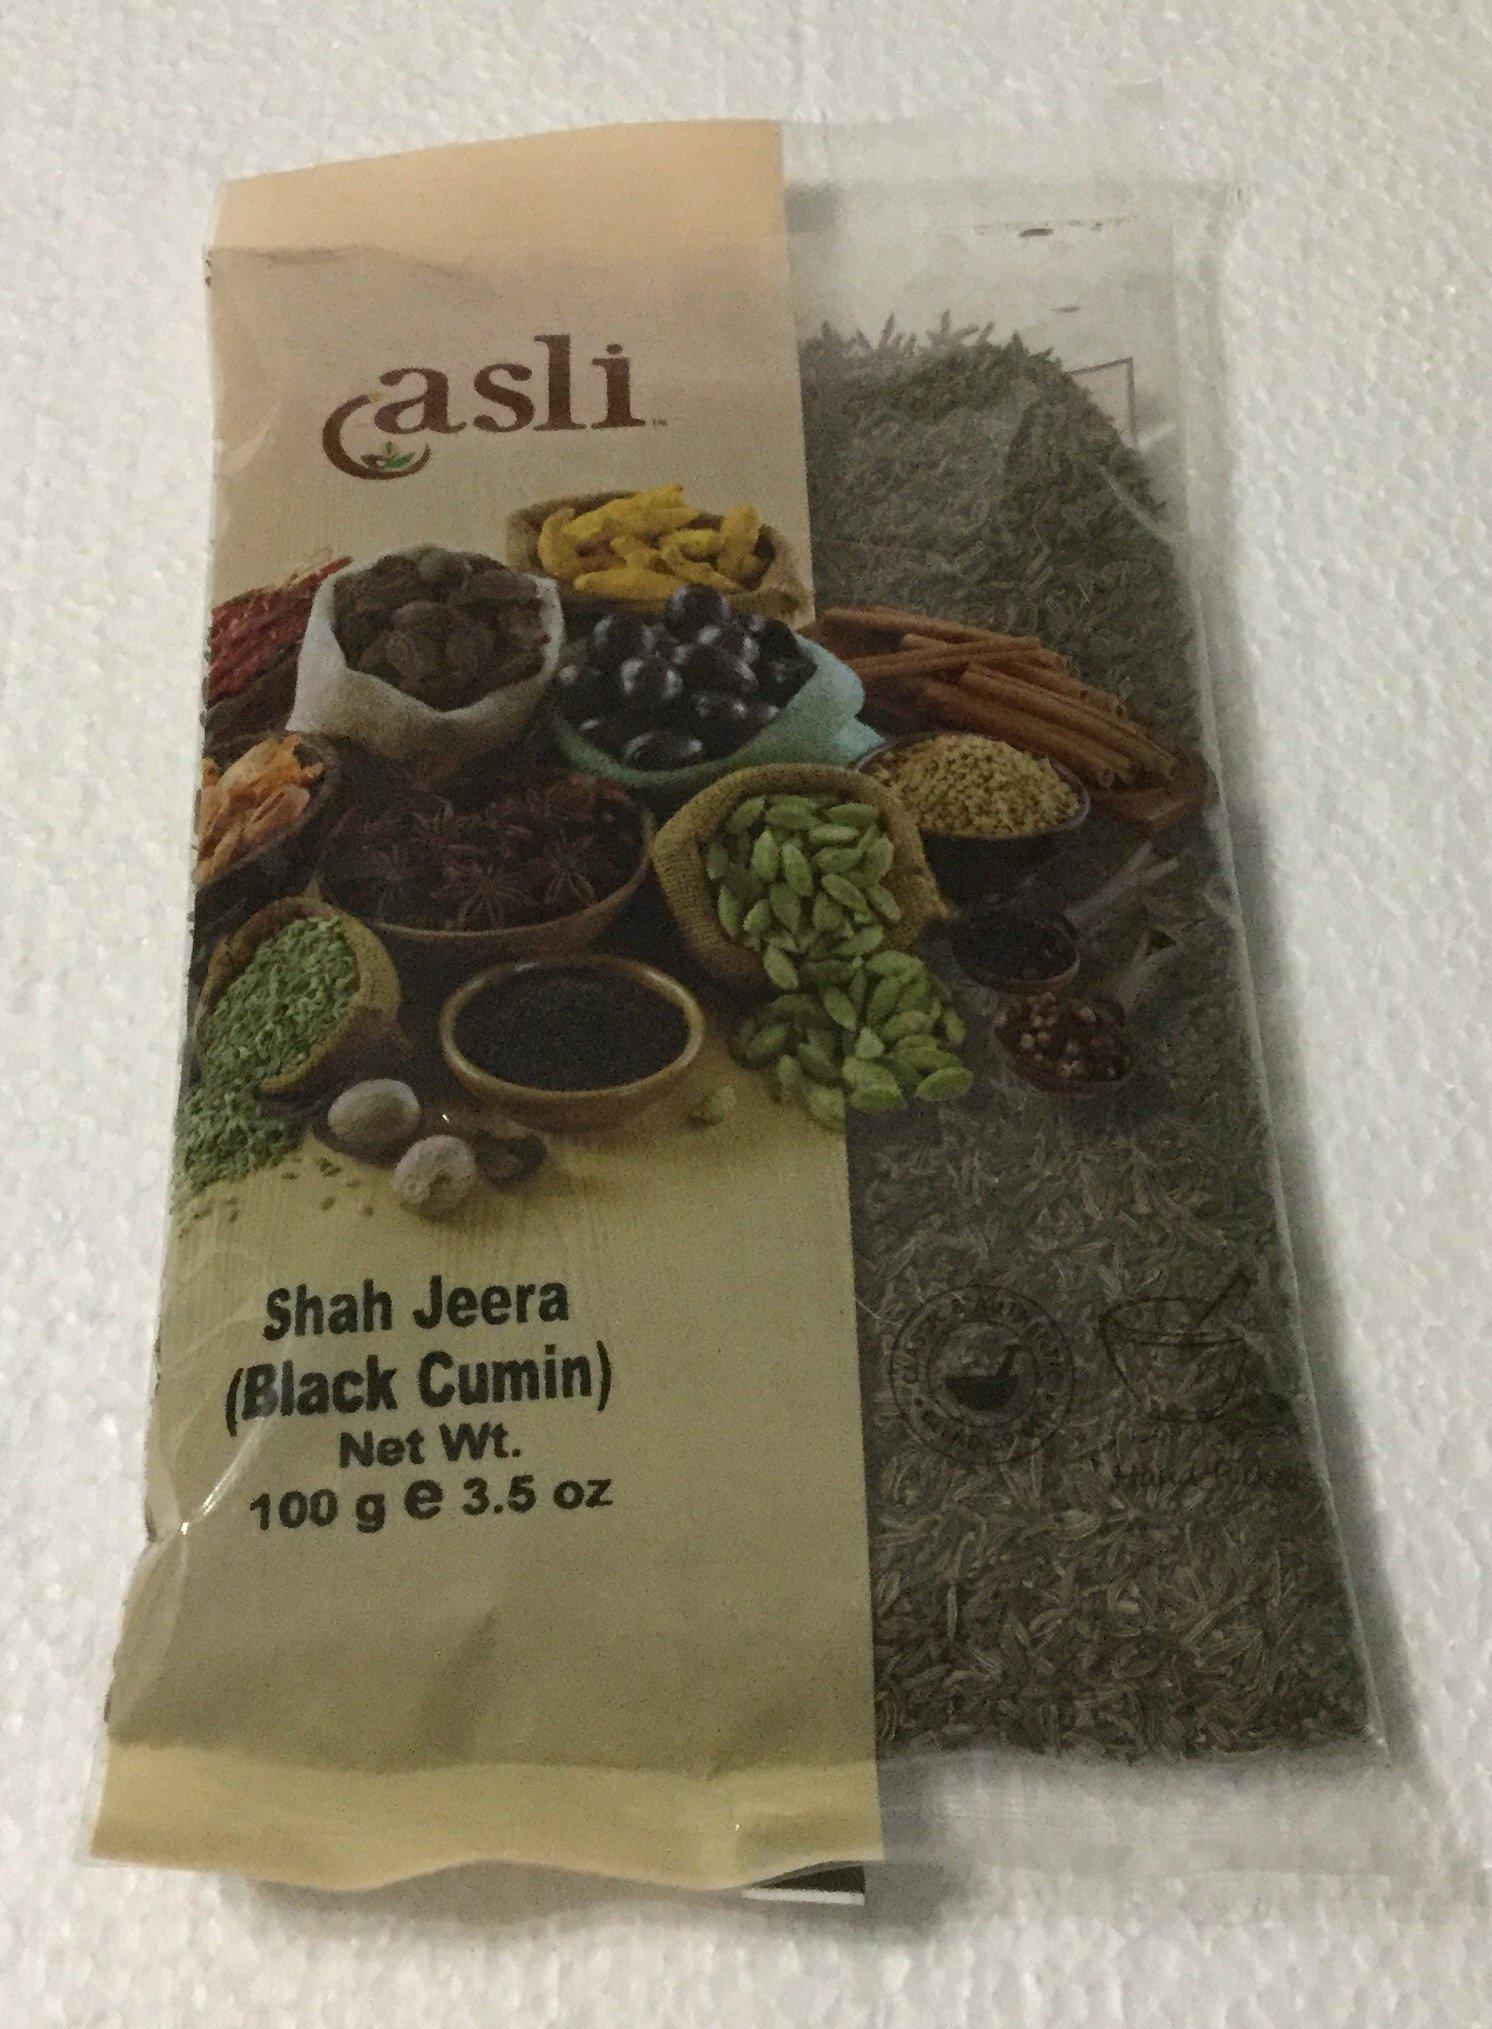 Asli Shah Jeera (Black Cumin) - 100g., 3.5oz